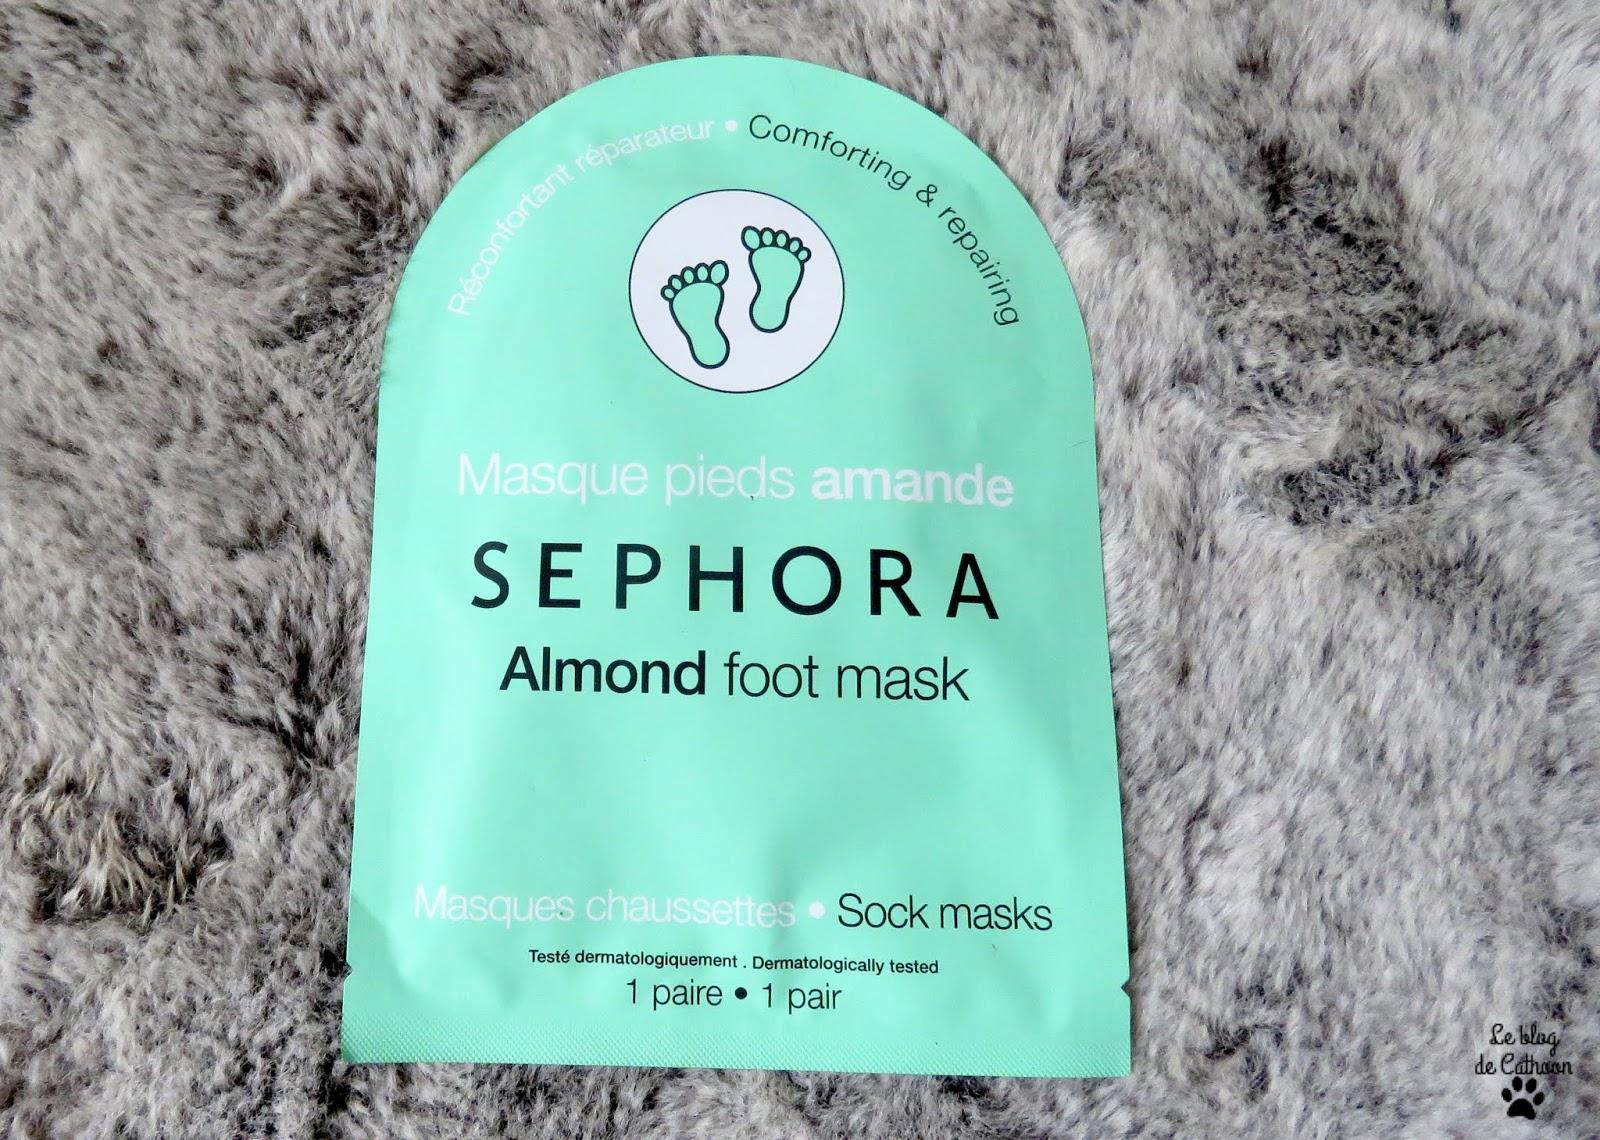 Masque Pieds Amande - Sephora